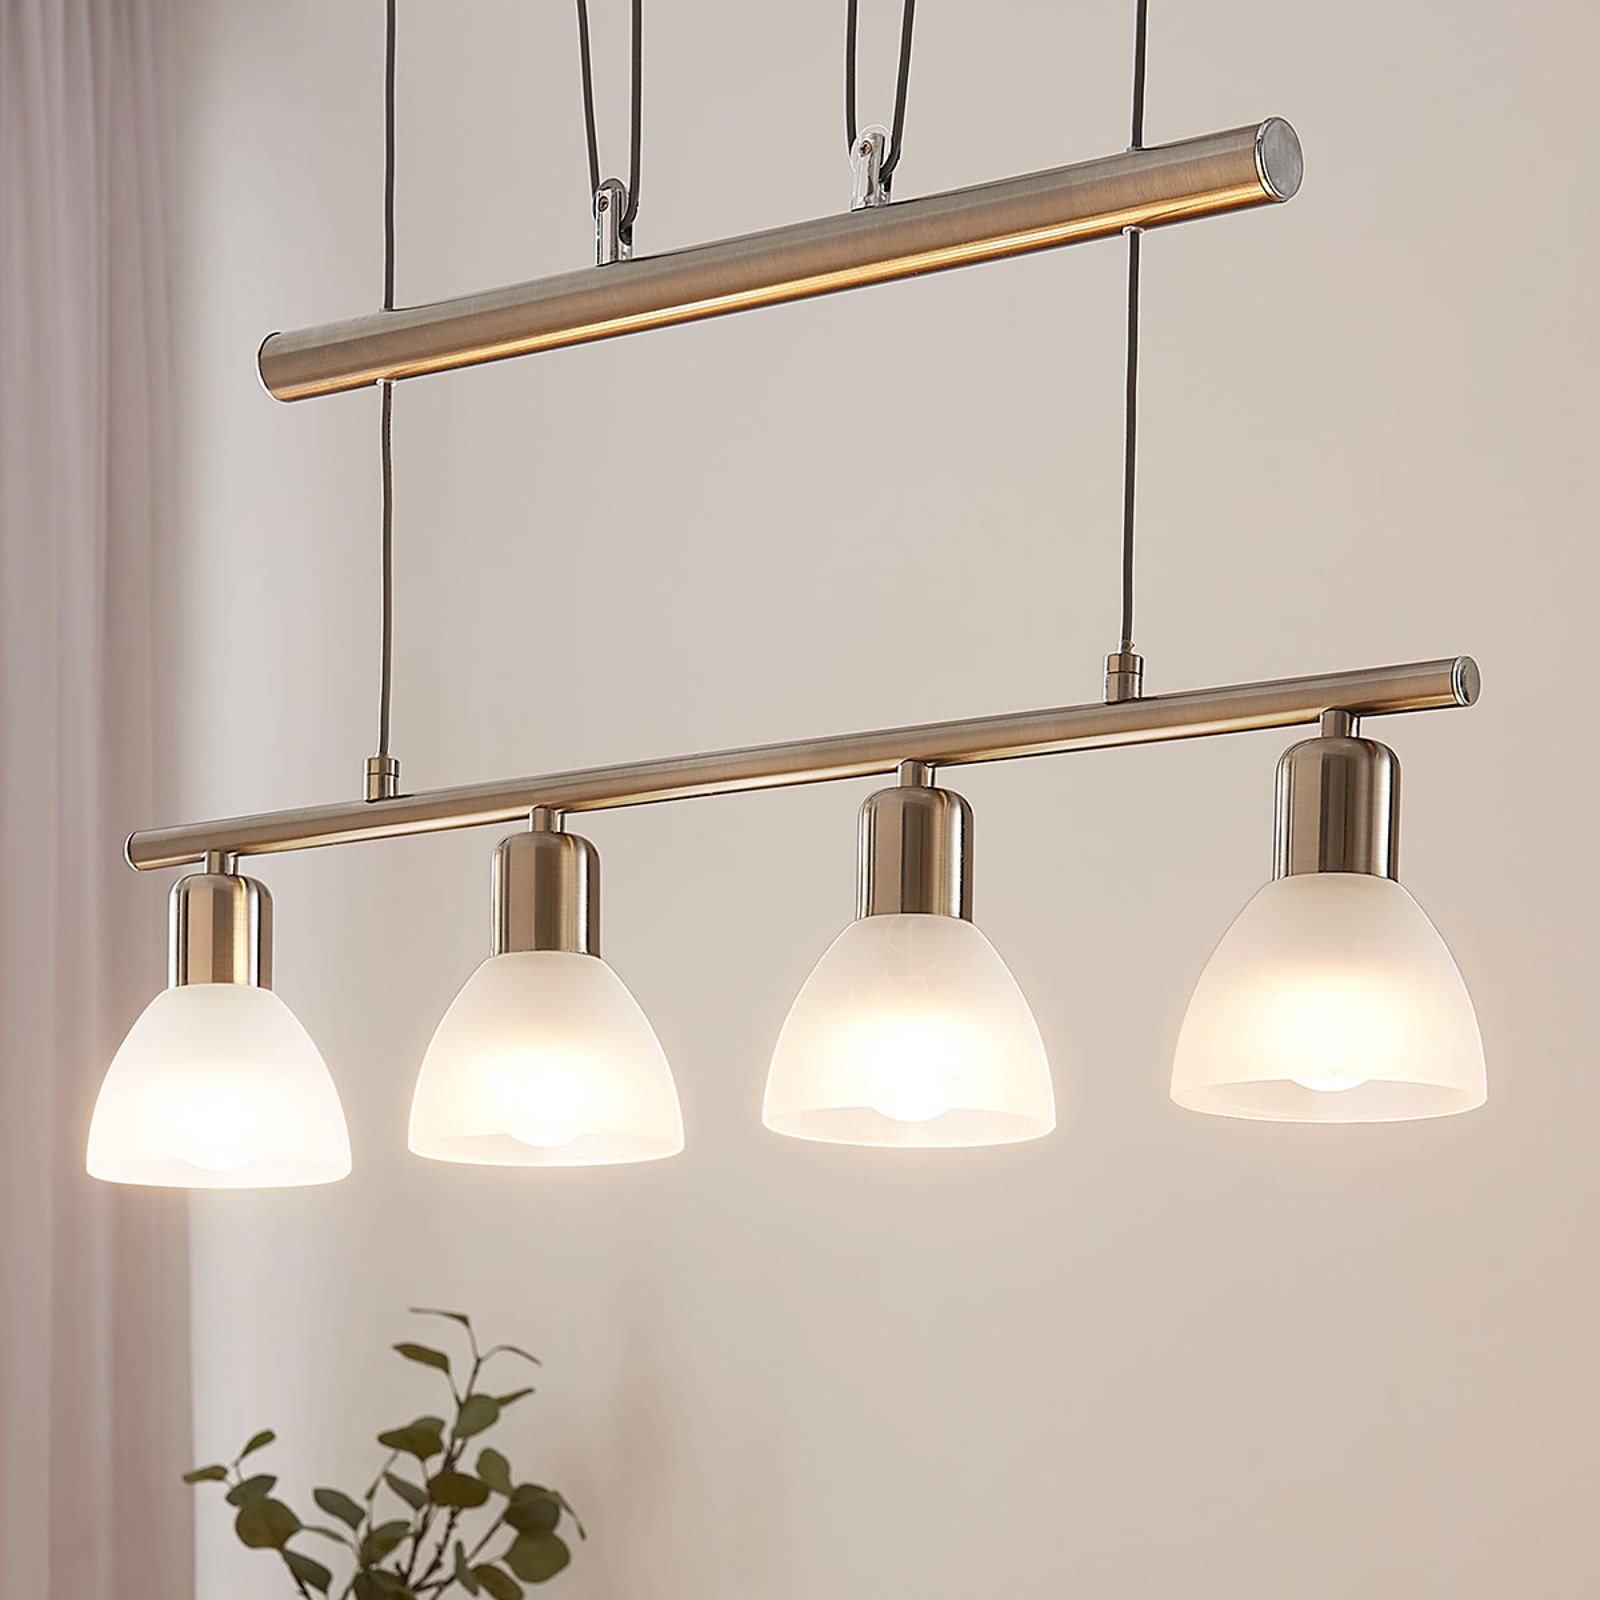 Suspension LED Gwendolin, hauteur variable